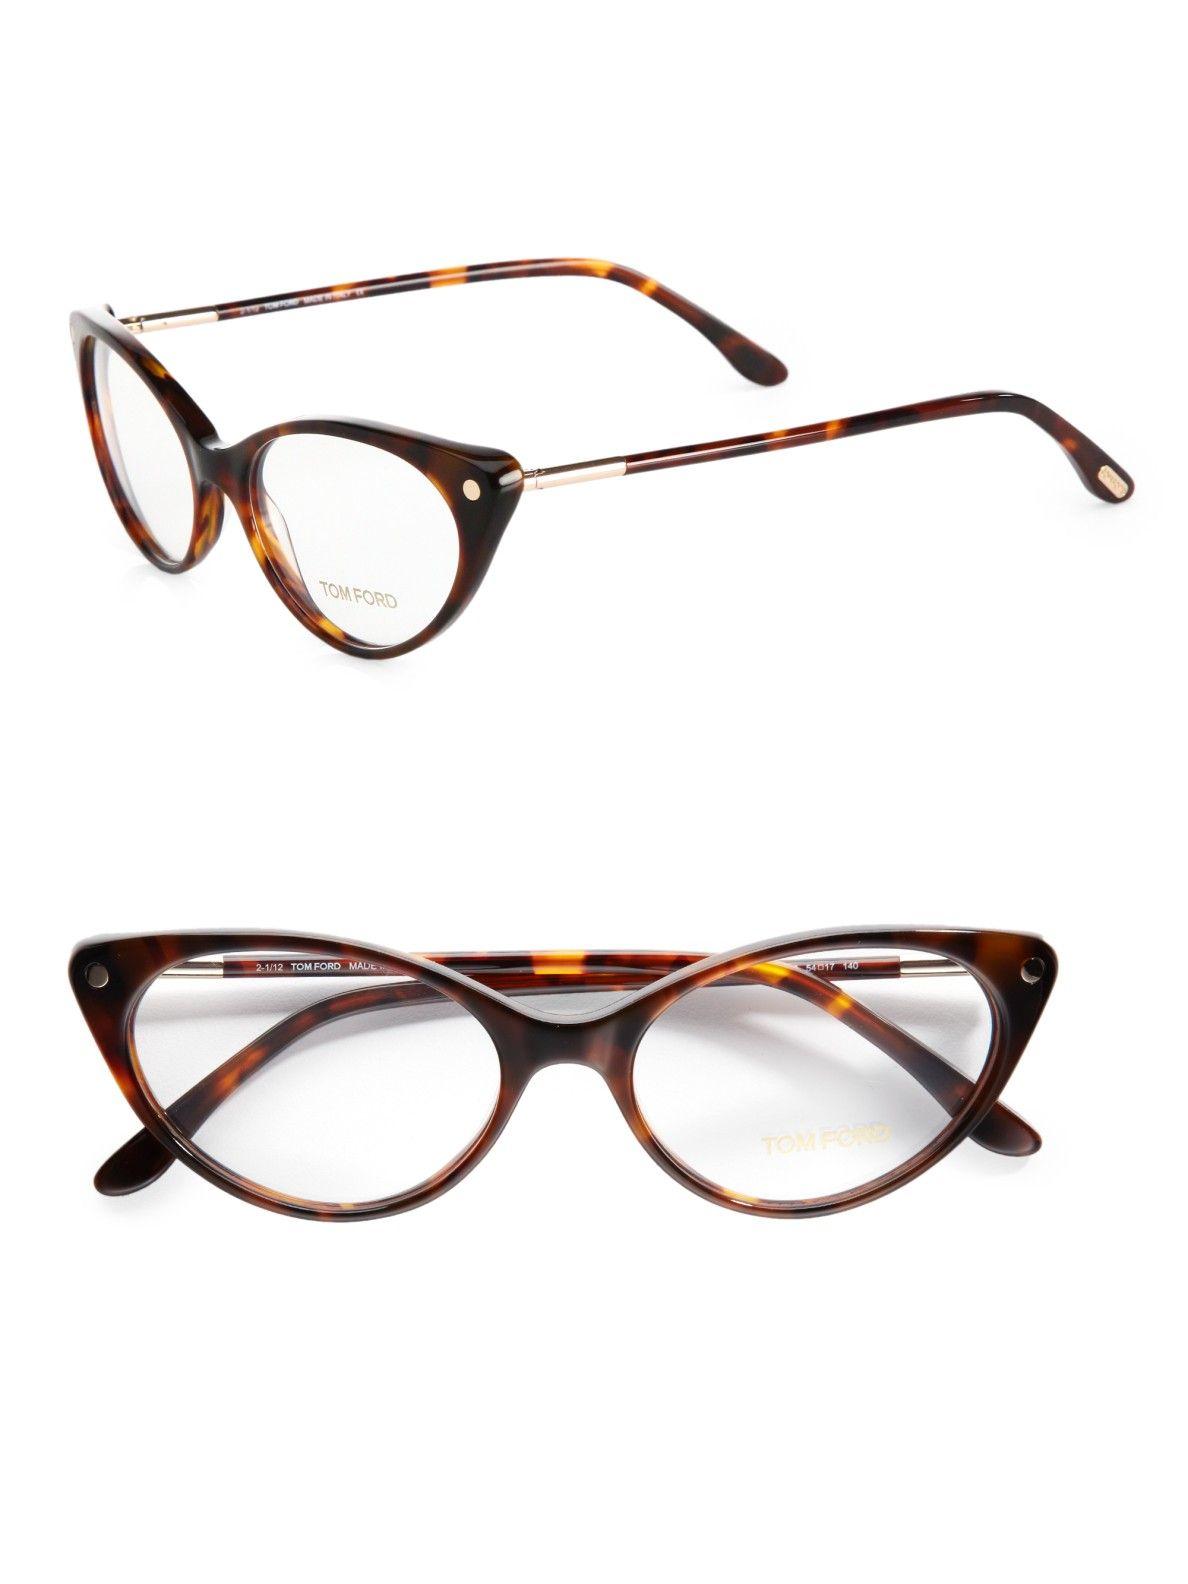 700c93e72aa Tom Ford Modern Cats-Eye Plastic Eyeglasses in Brown (havana)